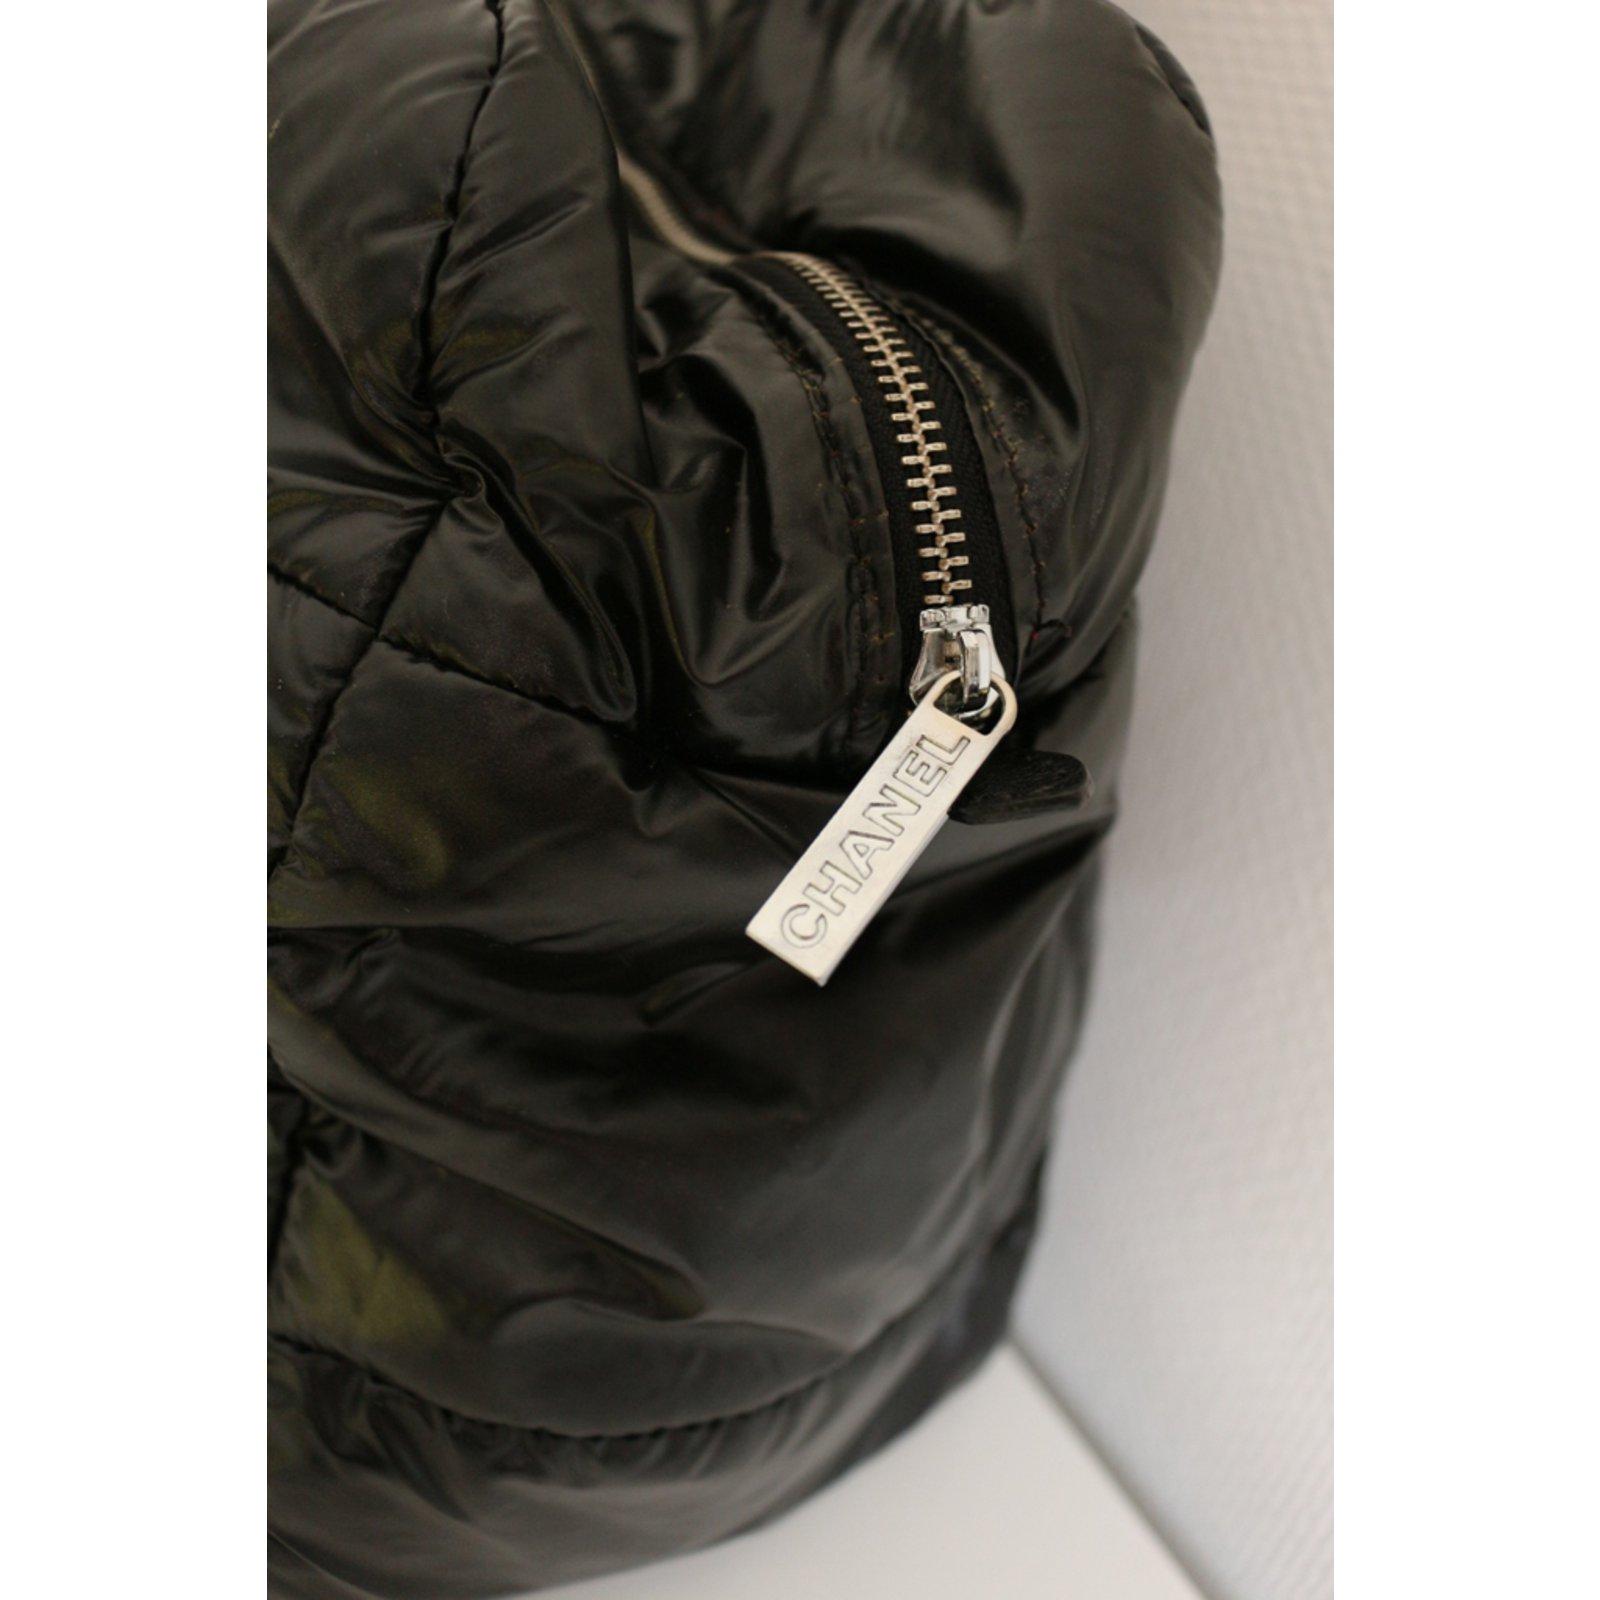 062d8dfe5c36 Chanel Coco Cocoon Totes Synthetic Black ref.98560 - Joli Closet